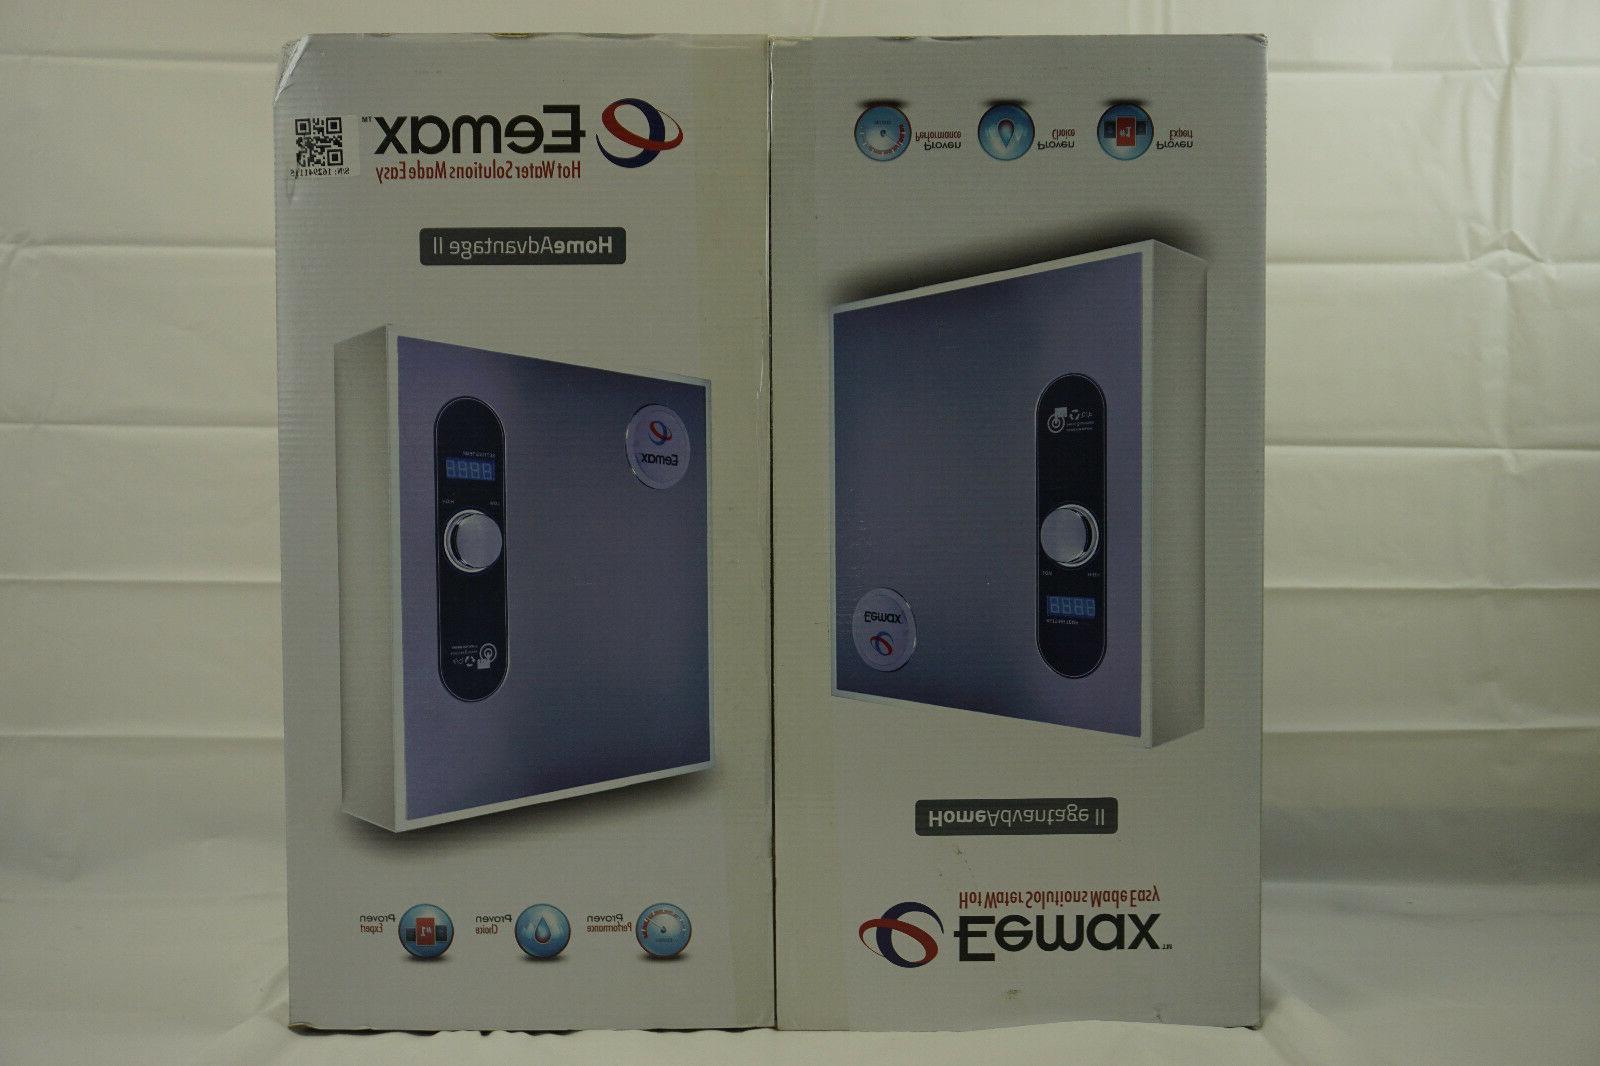 Eemax HA027240 HomeAdvantage II Electric Tankless Water Heat